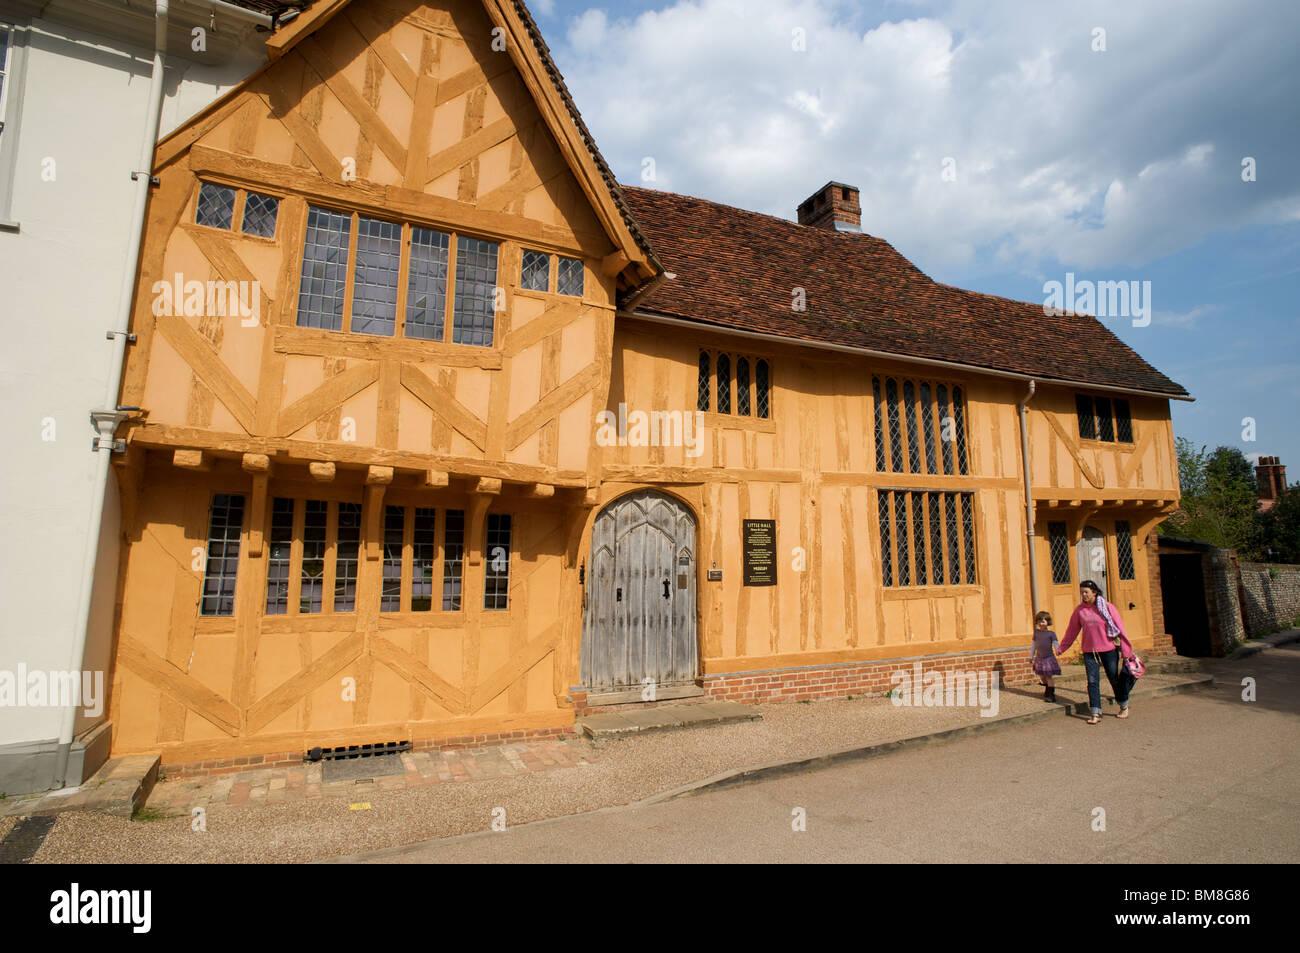 Little Hall, Lavenham, Suffolk, England. - Stock Image